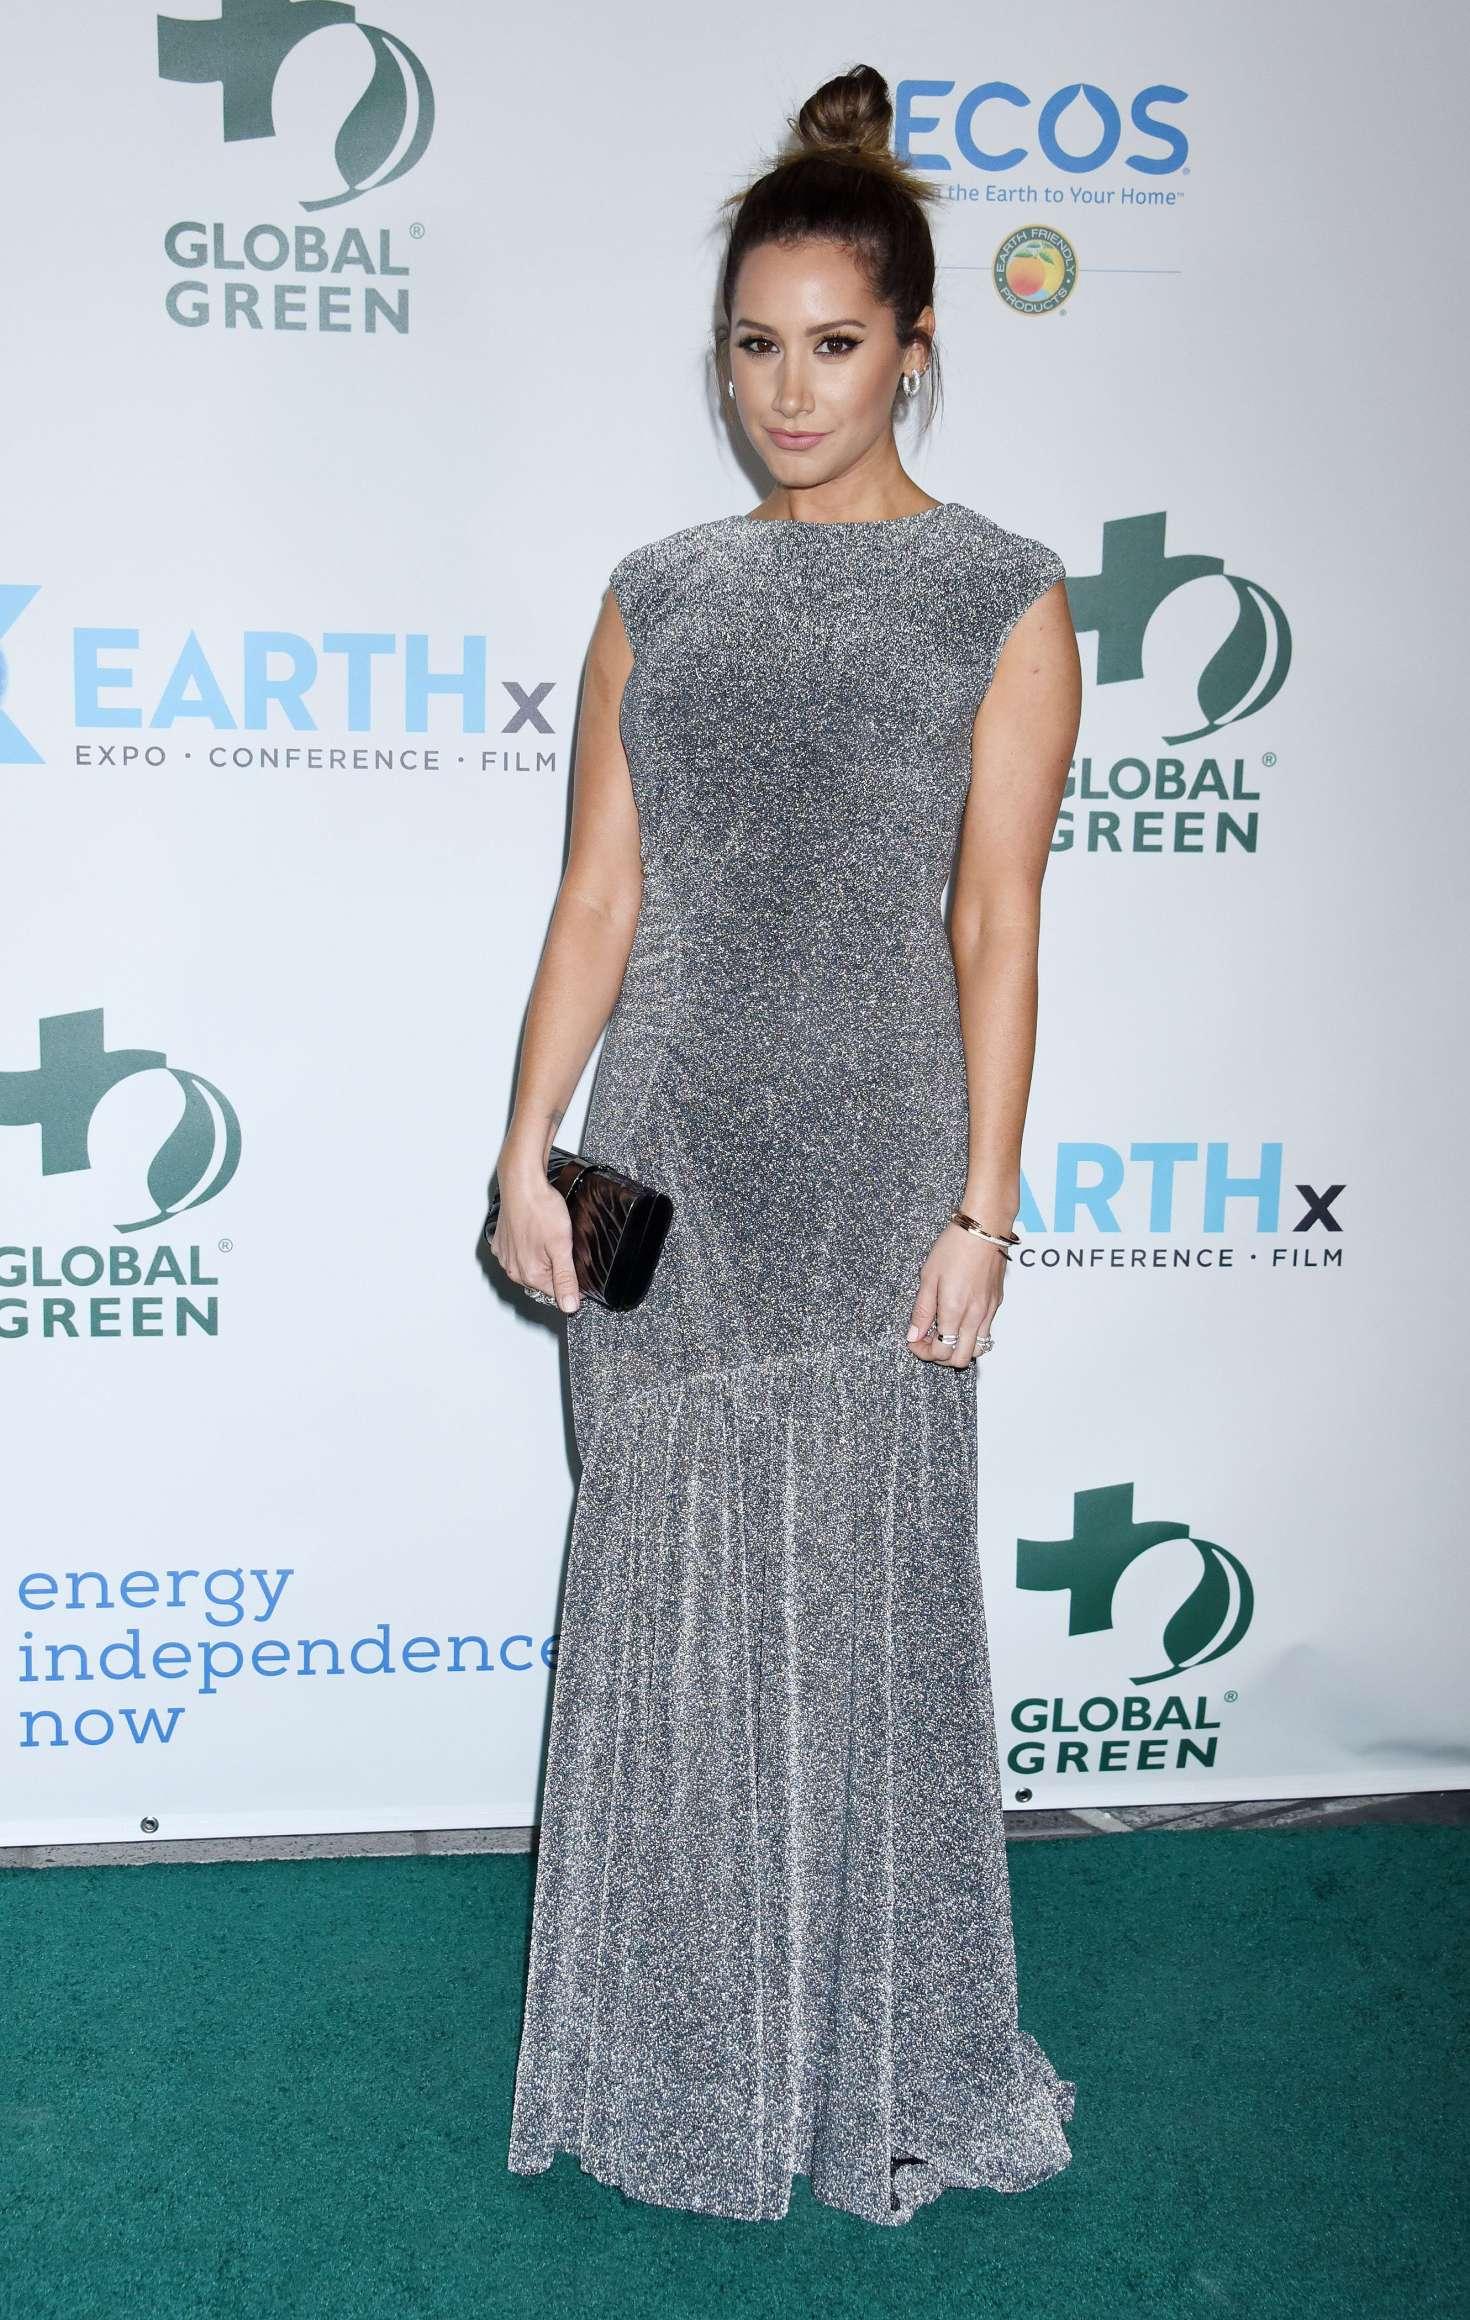 Ashley Tisdale 2018 : Ashley Tisdale: Global Green Pre Oscars Party 2018 -03